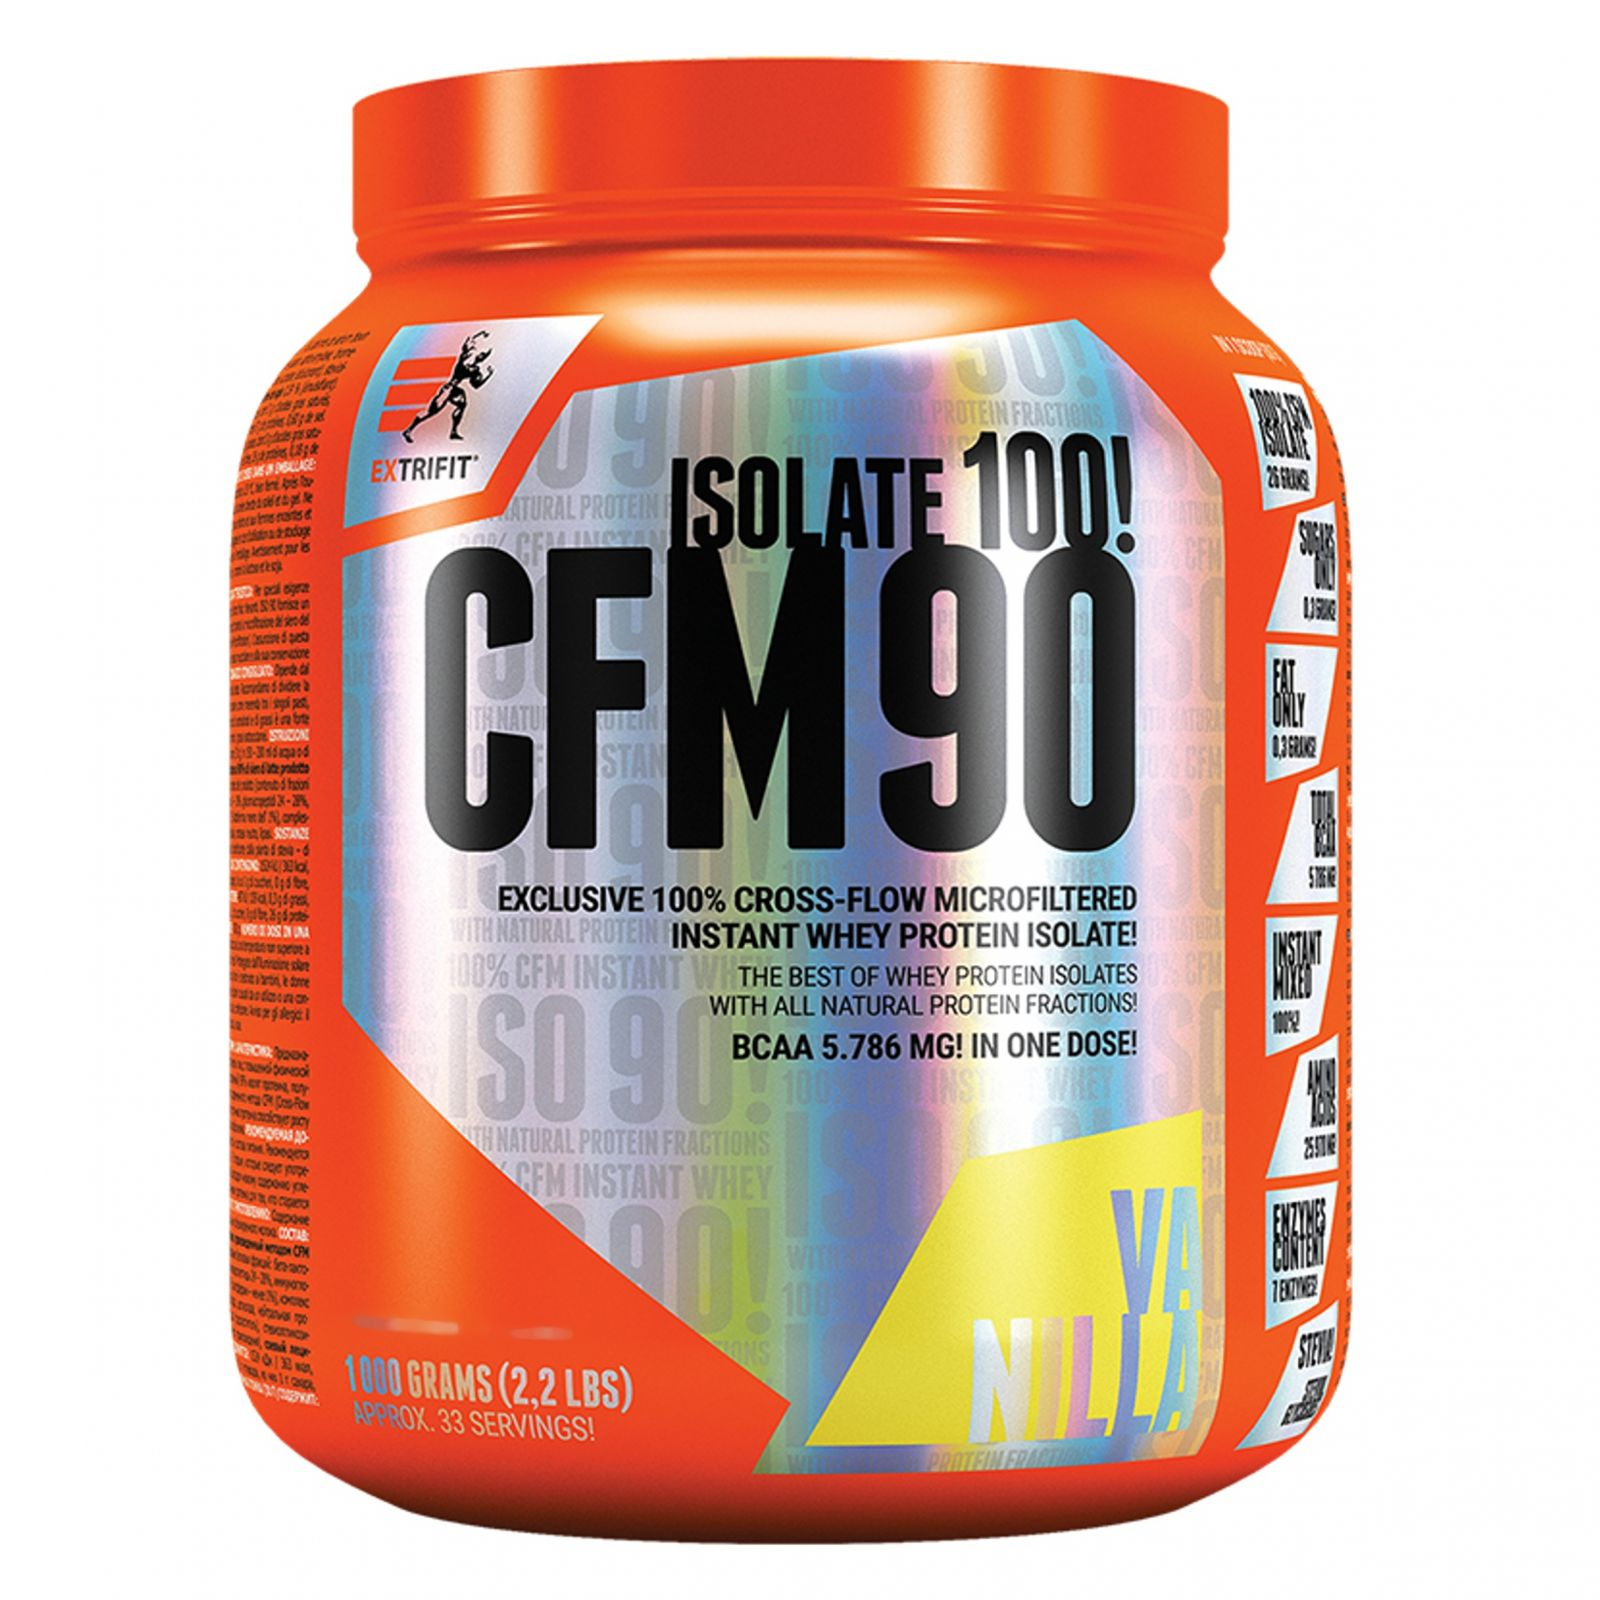 Extrifit ISO 90 CFM Instant Whey - 1000 g